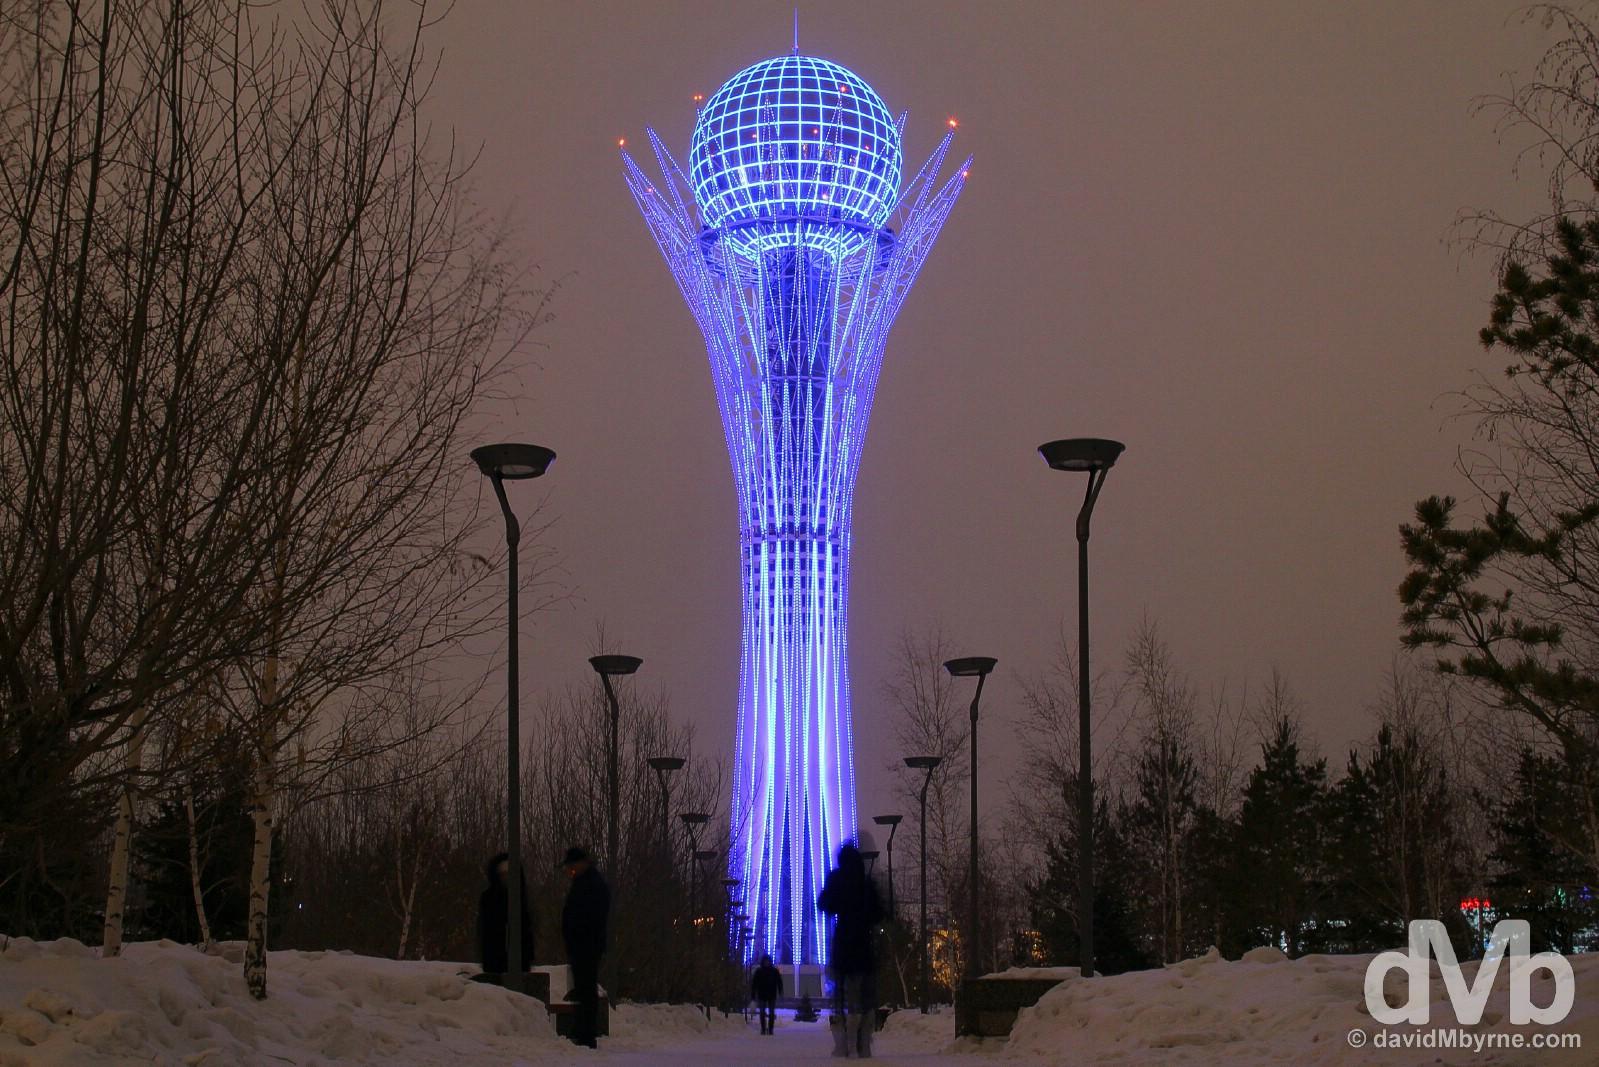 A nighttime view of the Bayterek Monument in Astana, Kazakhstan. February 16, 2015.